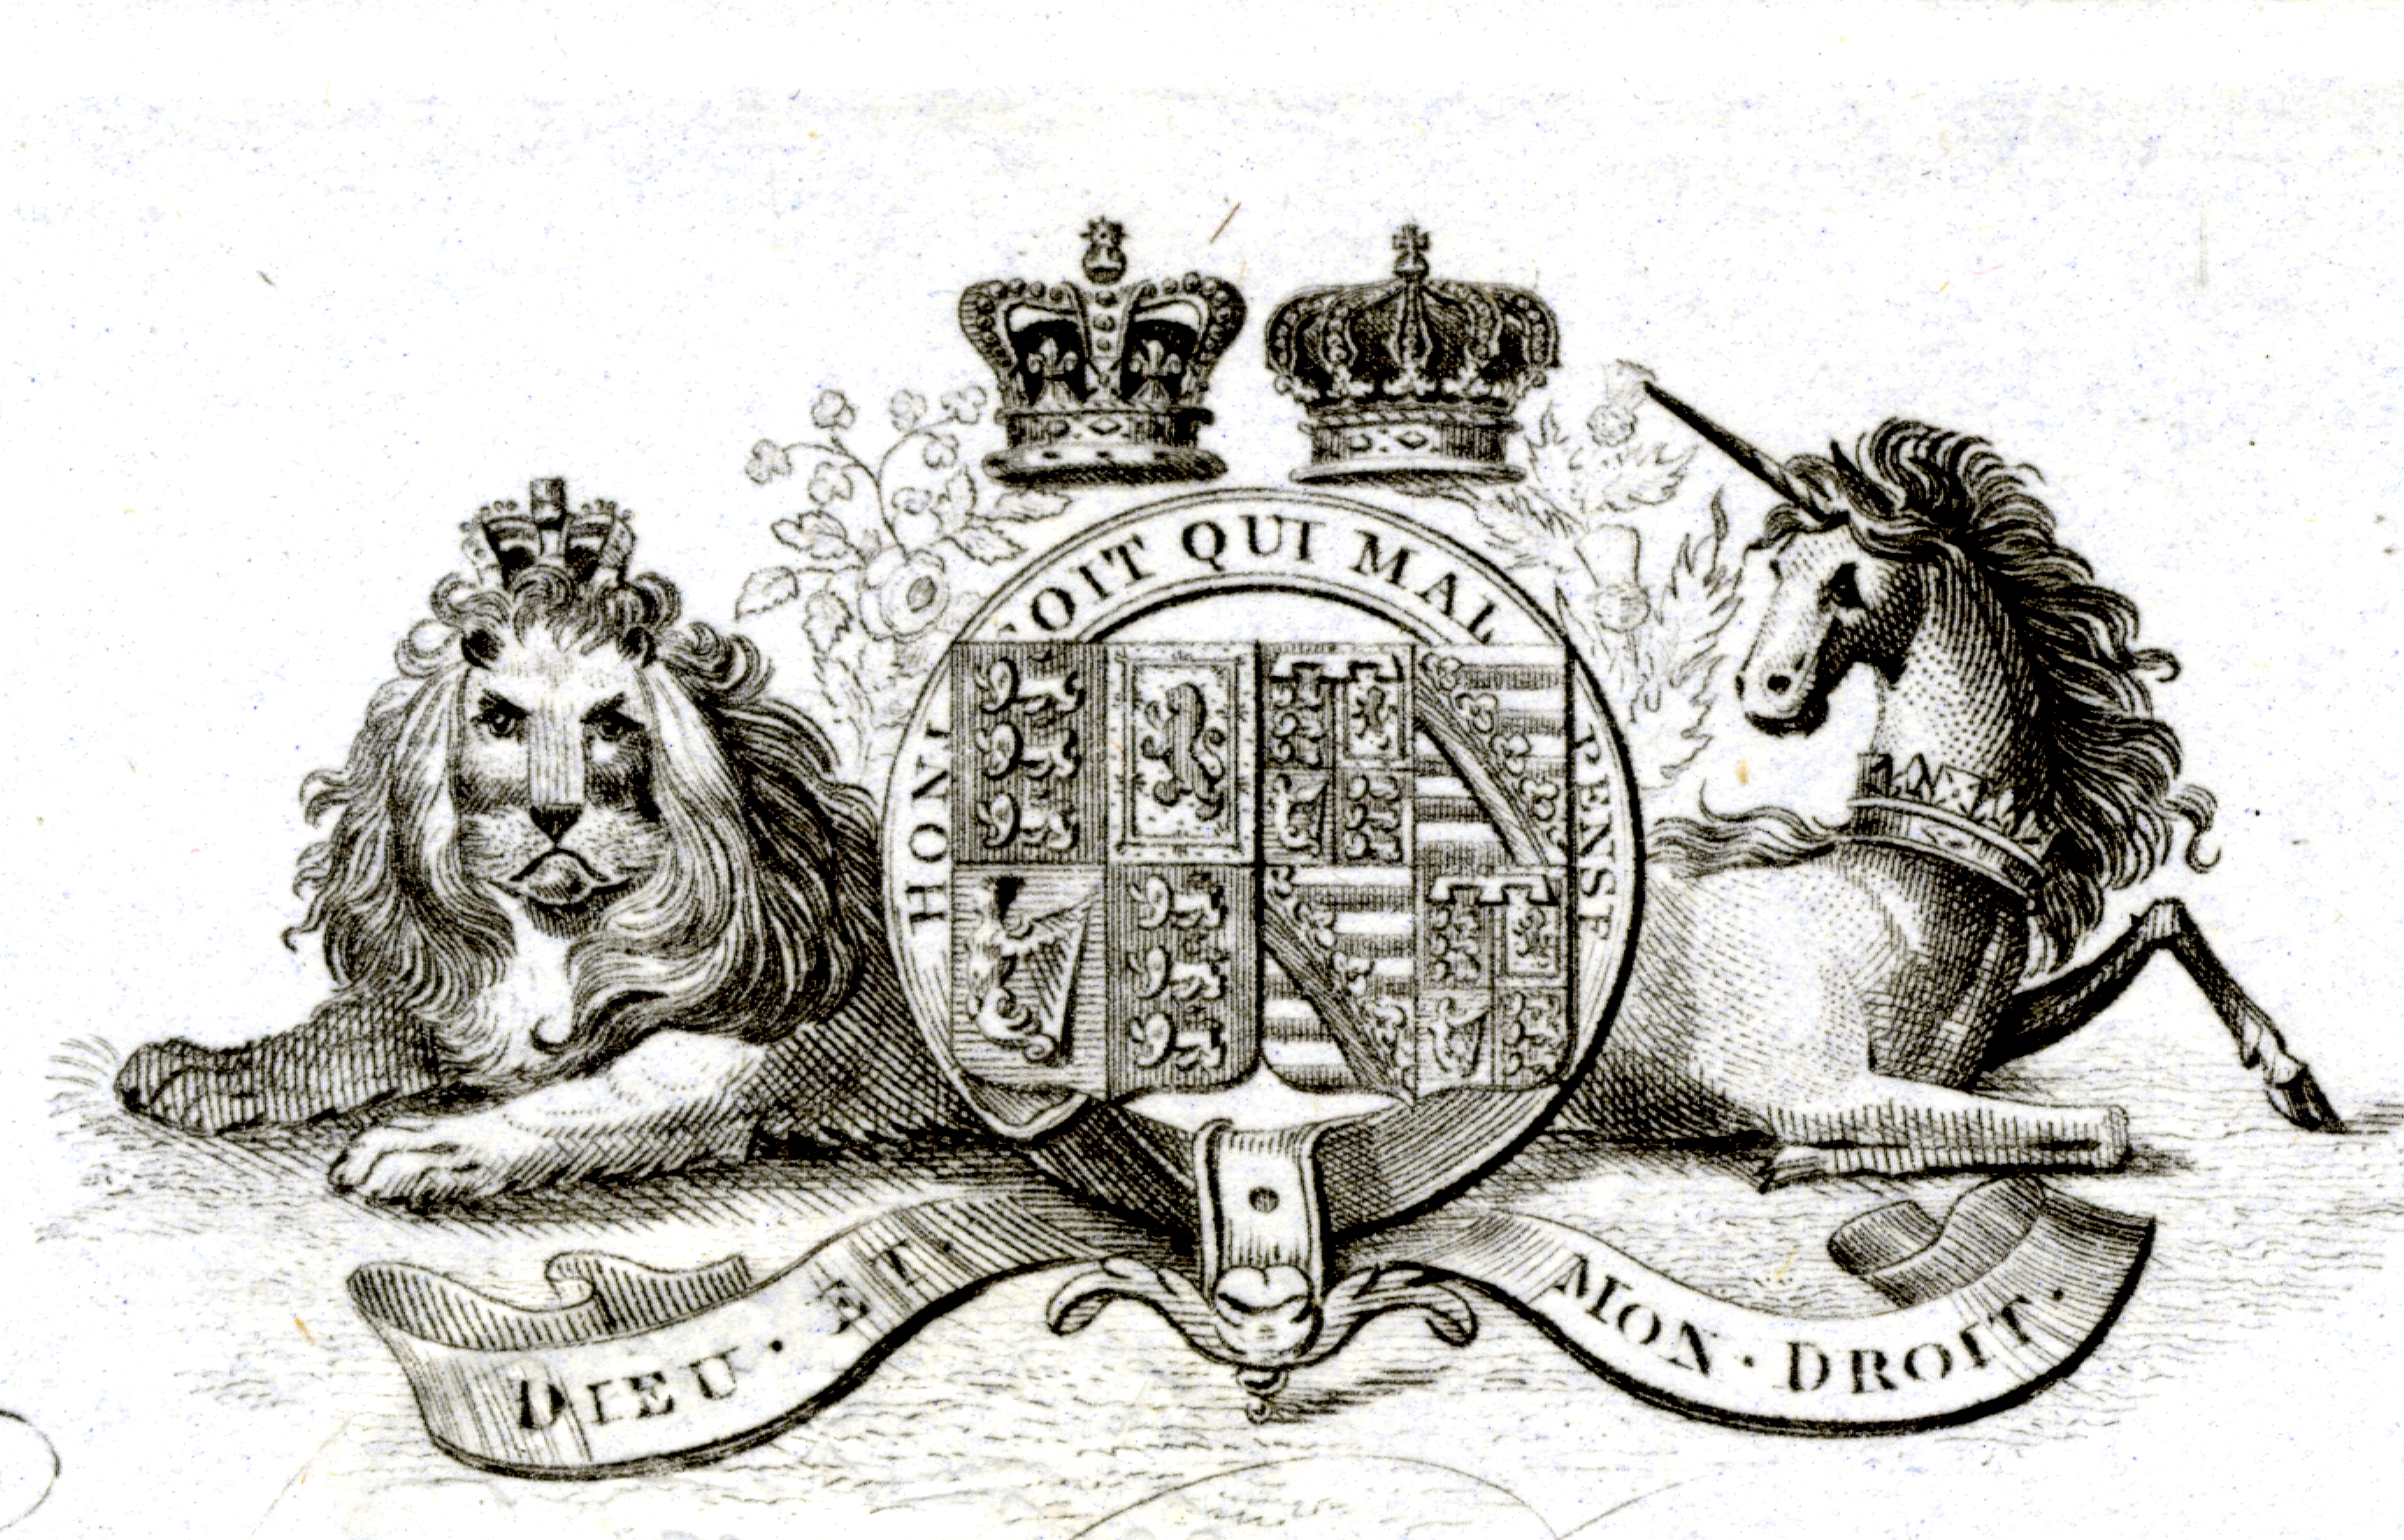 Crest of R. & S. Garrard & Co., Haymarket, London (detail of previous receipt).